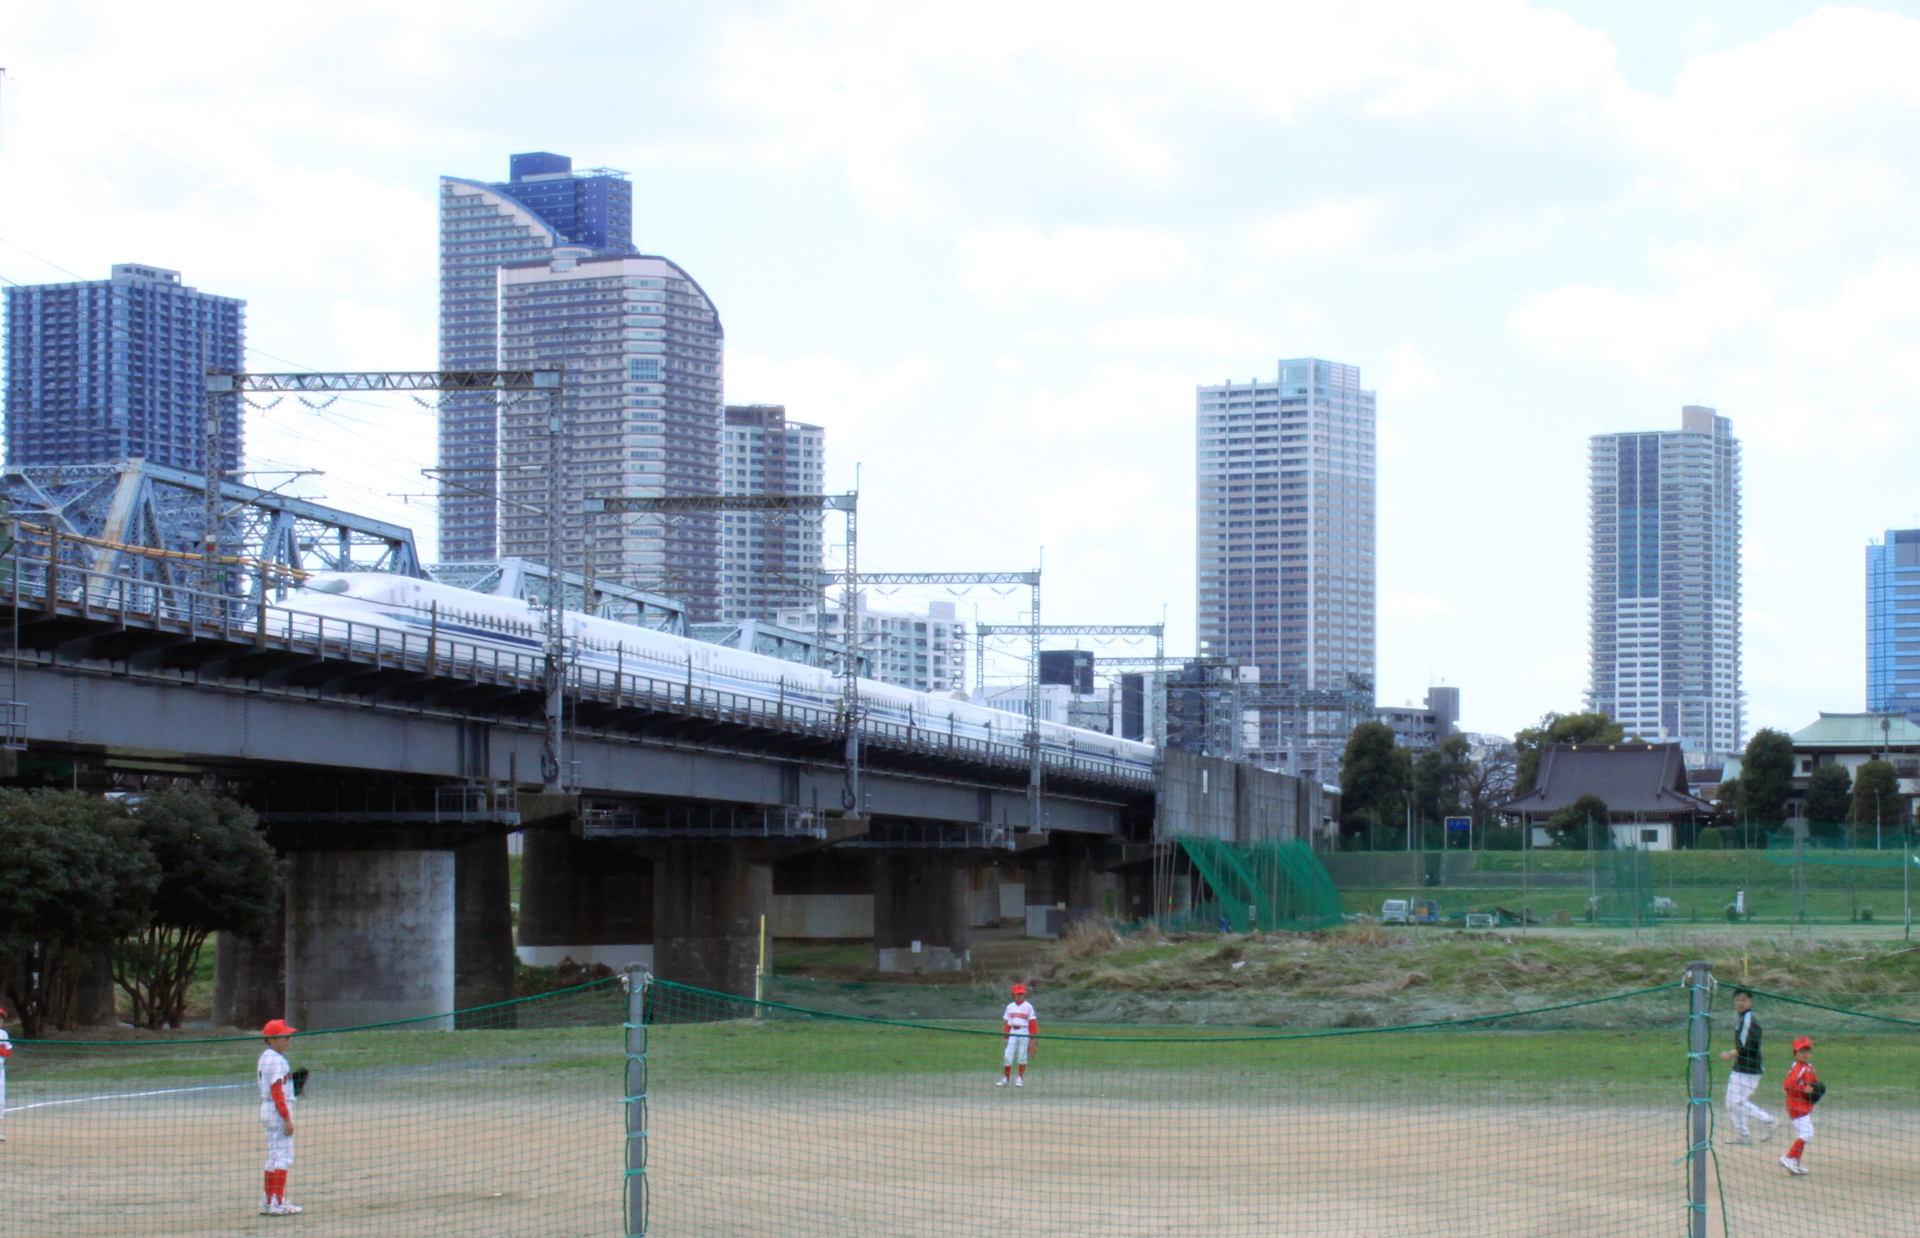 tokio japonia tokyo japan shinkansenpociag shinkansen iglawpodrozy